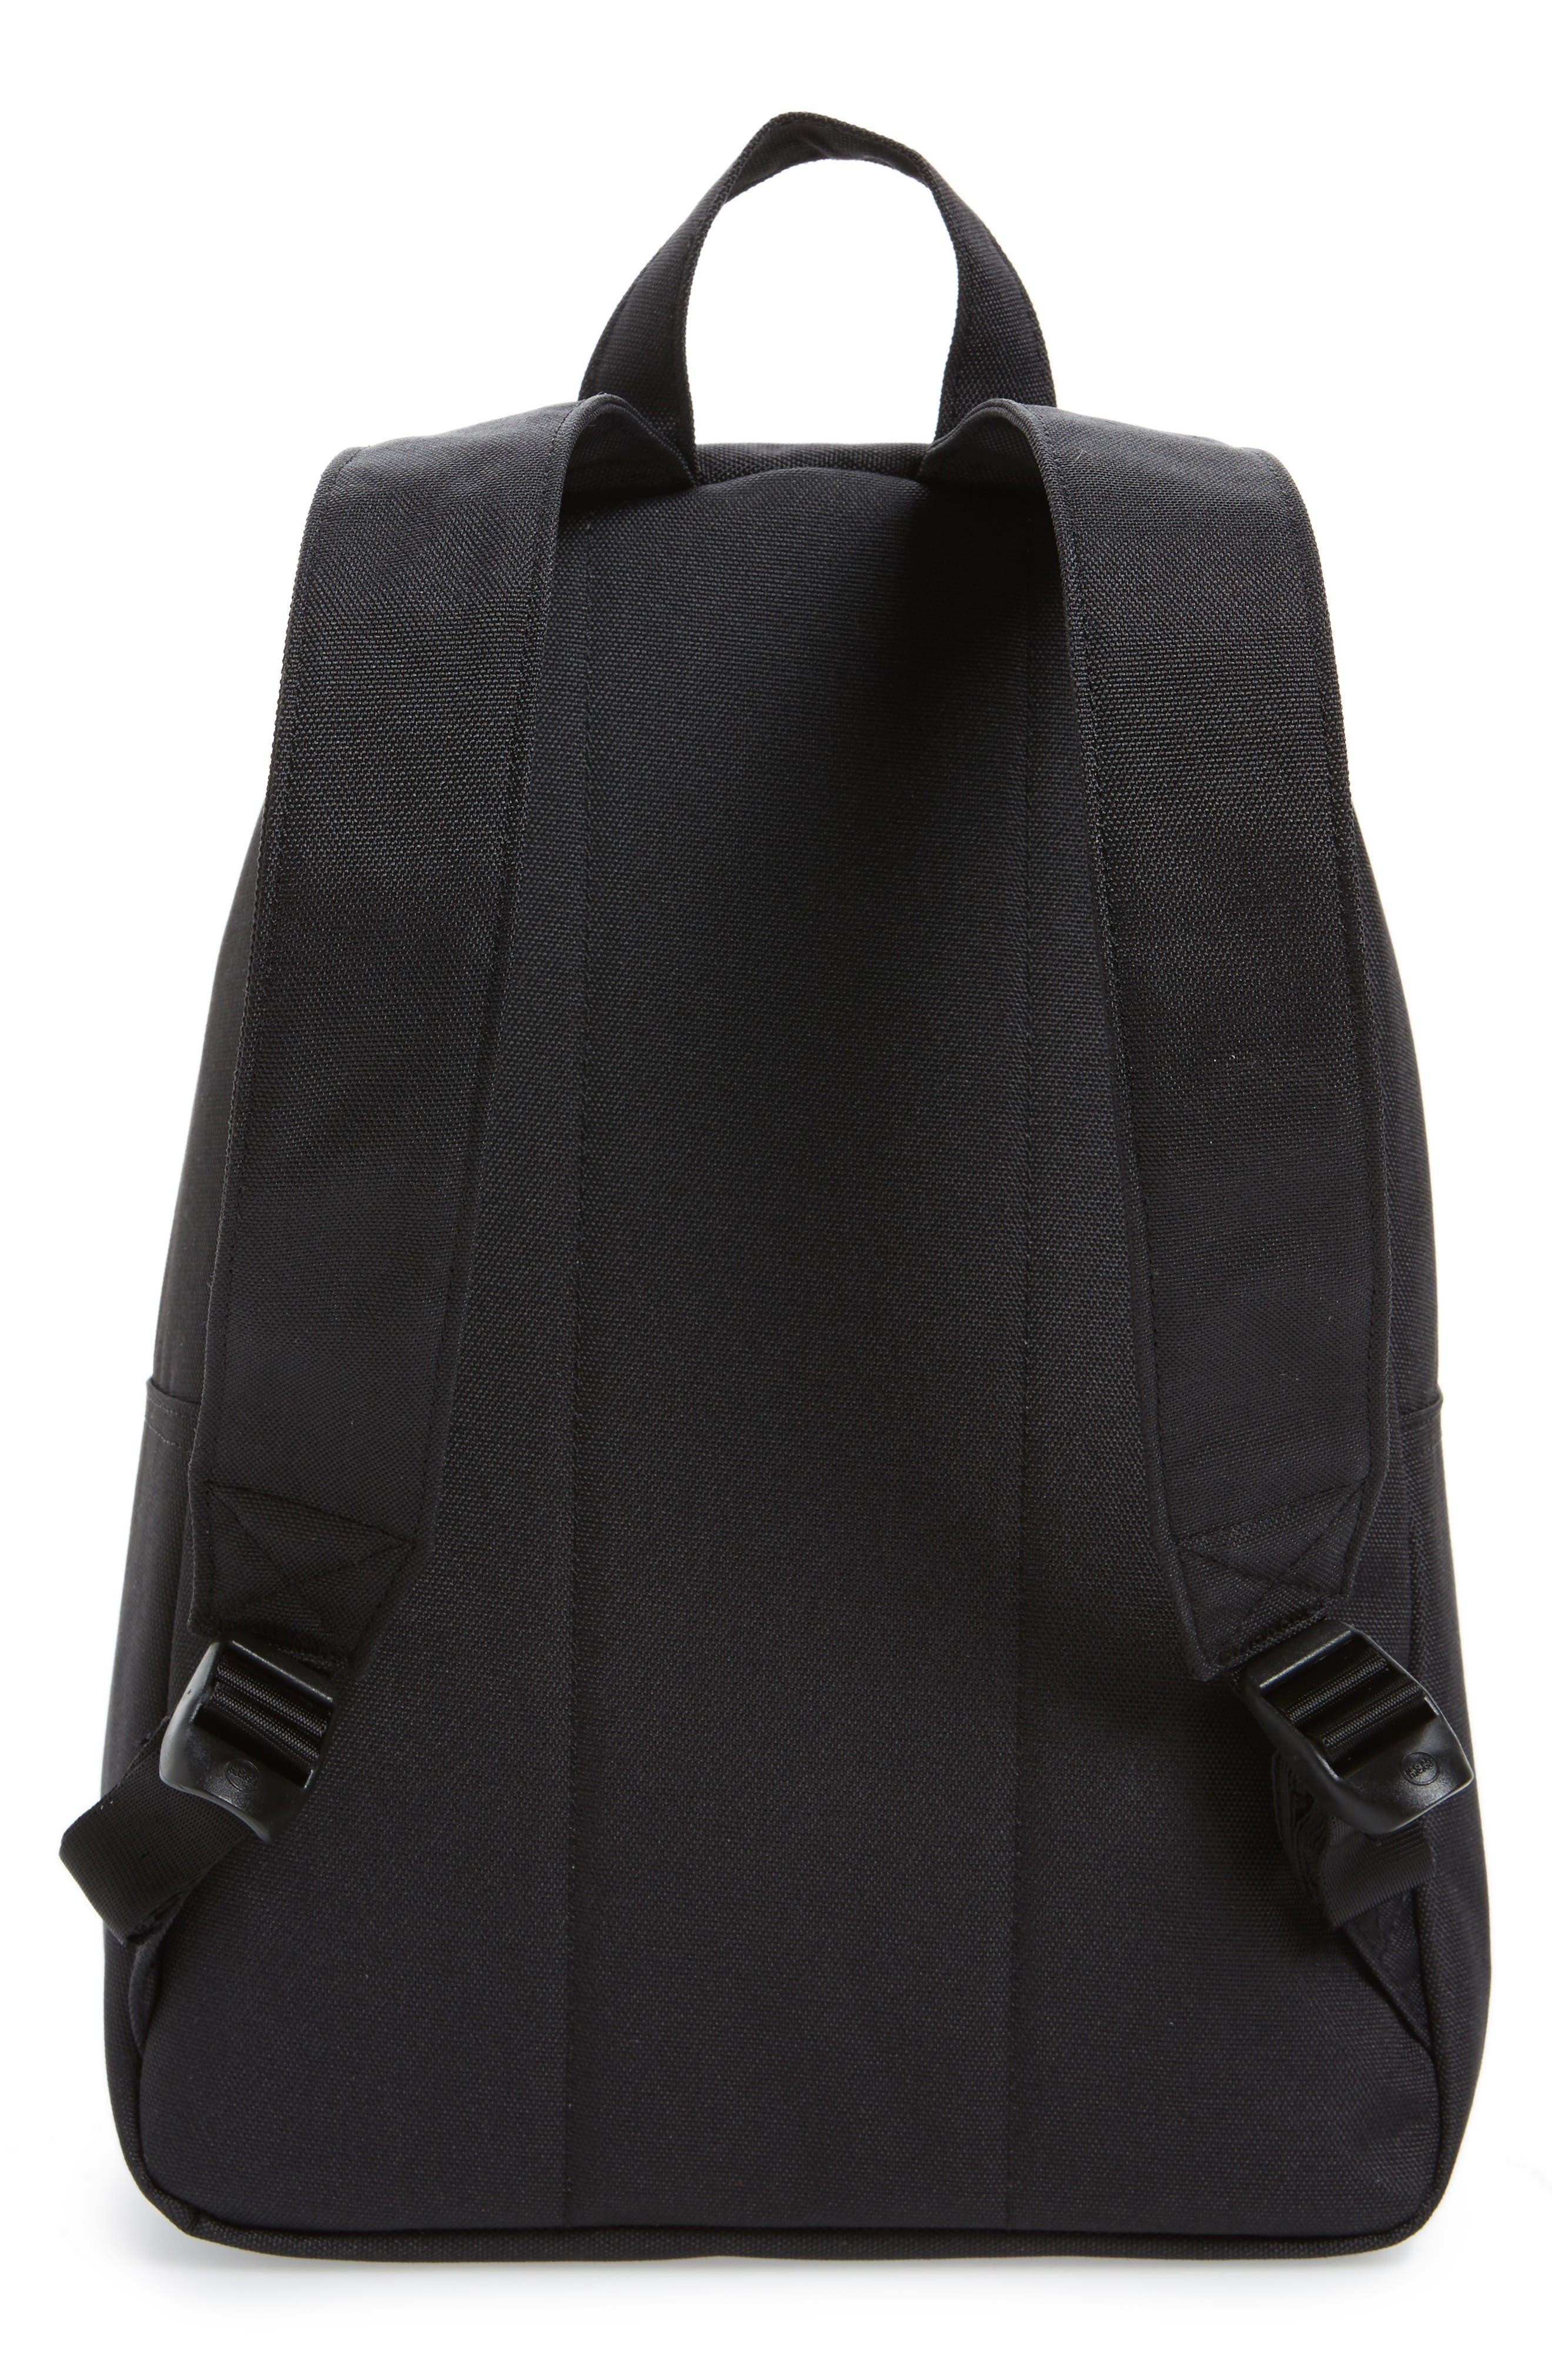 Alternate Image 3  - Herschel Supply Co. 'Town' Backpack